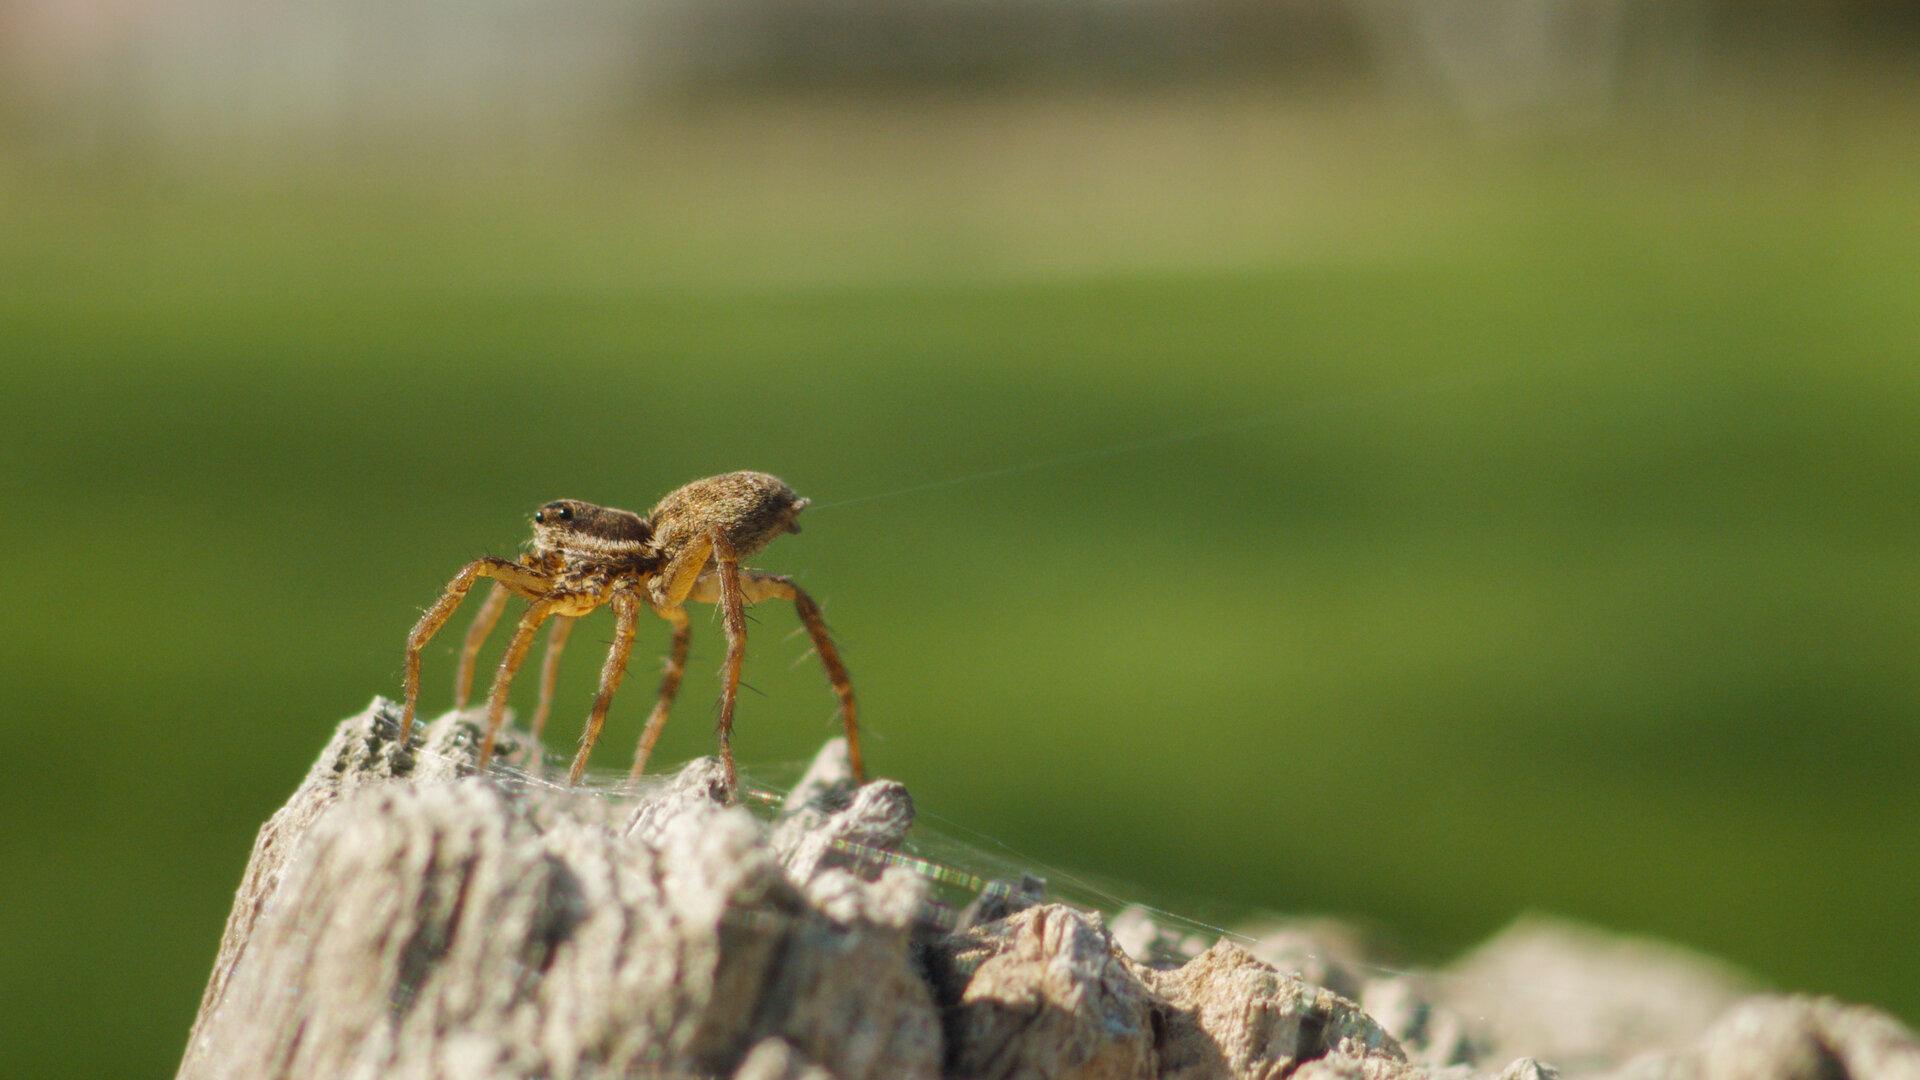 Araignée prête à voler